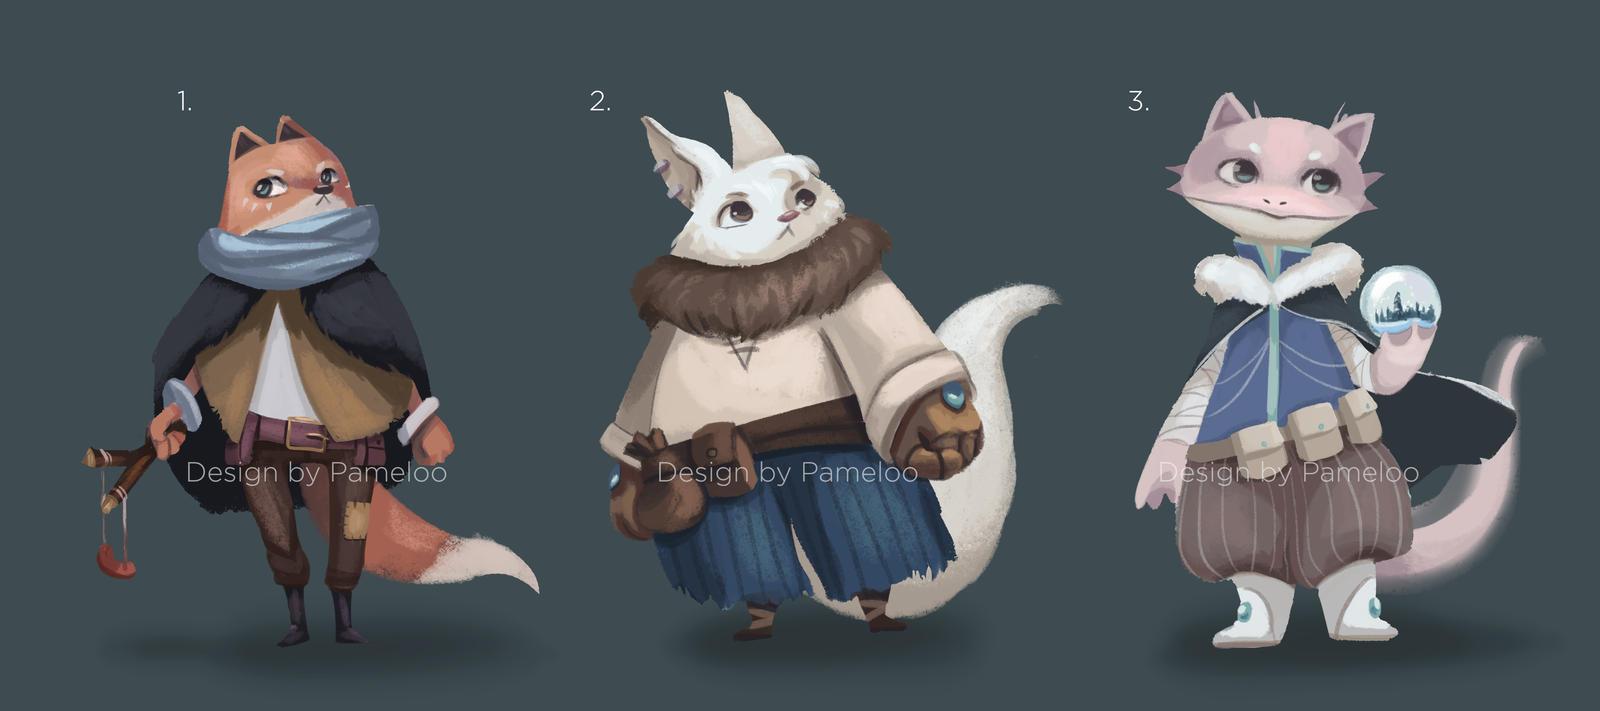 _open__wintery_character_designs_batch_01_by_pameloo_ddimfs9-fullview.jpg